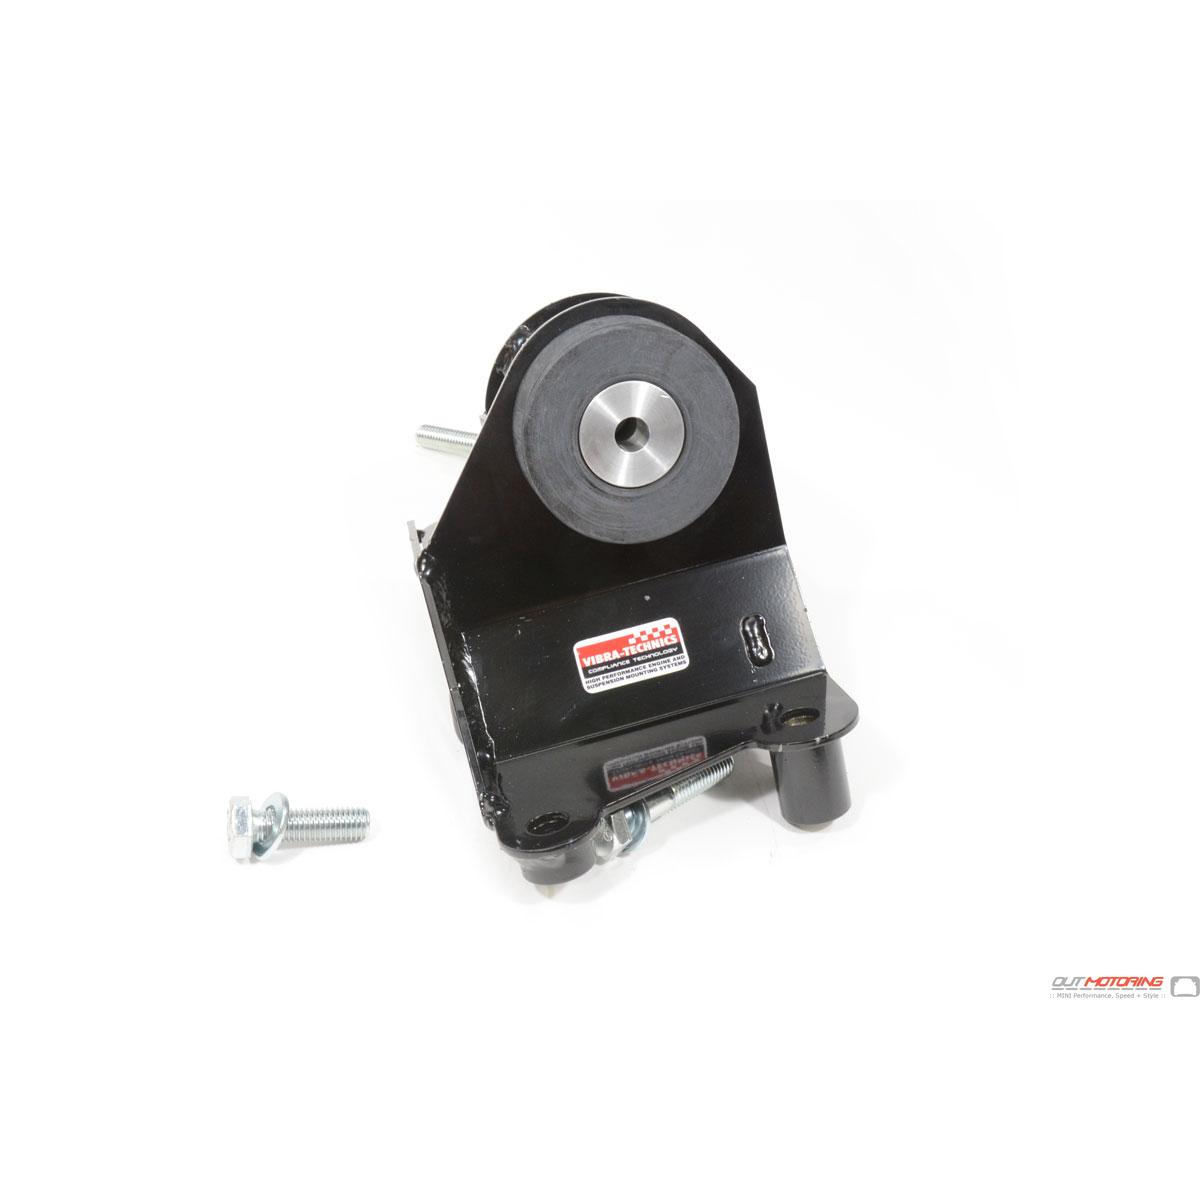 Vibra Technics MINI Cooper Gearbox Mount